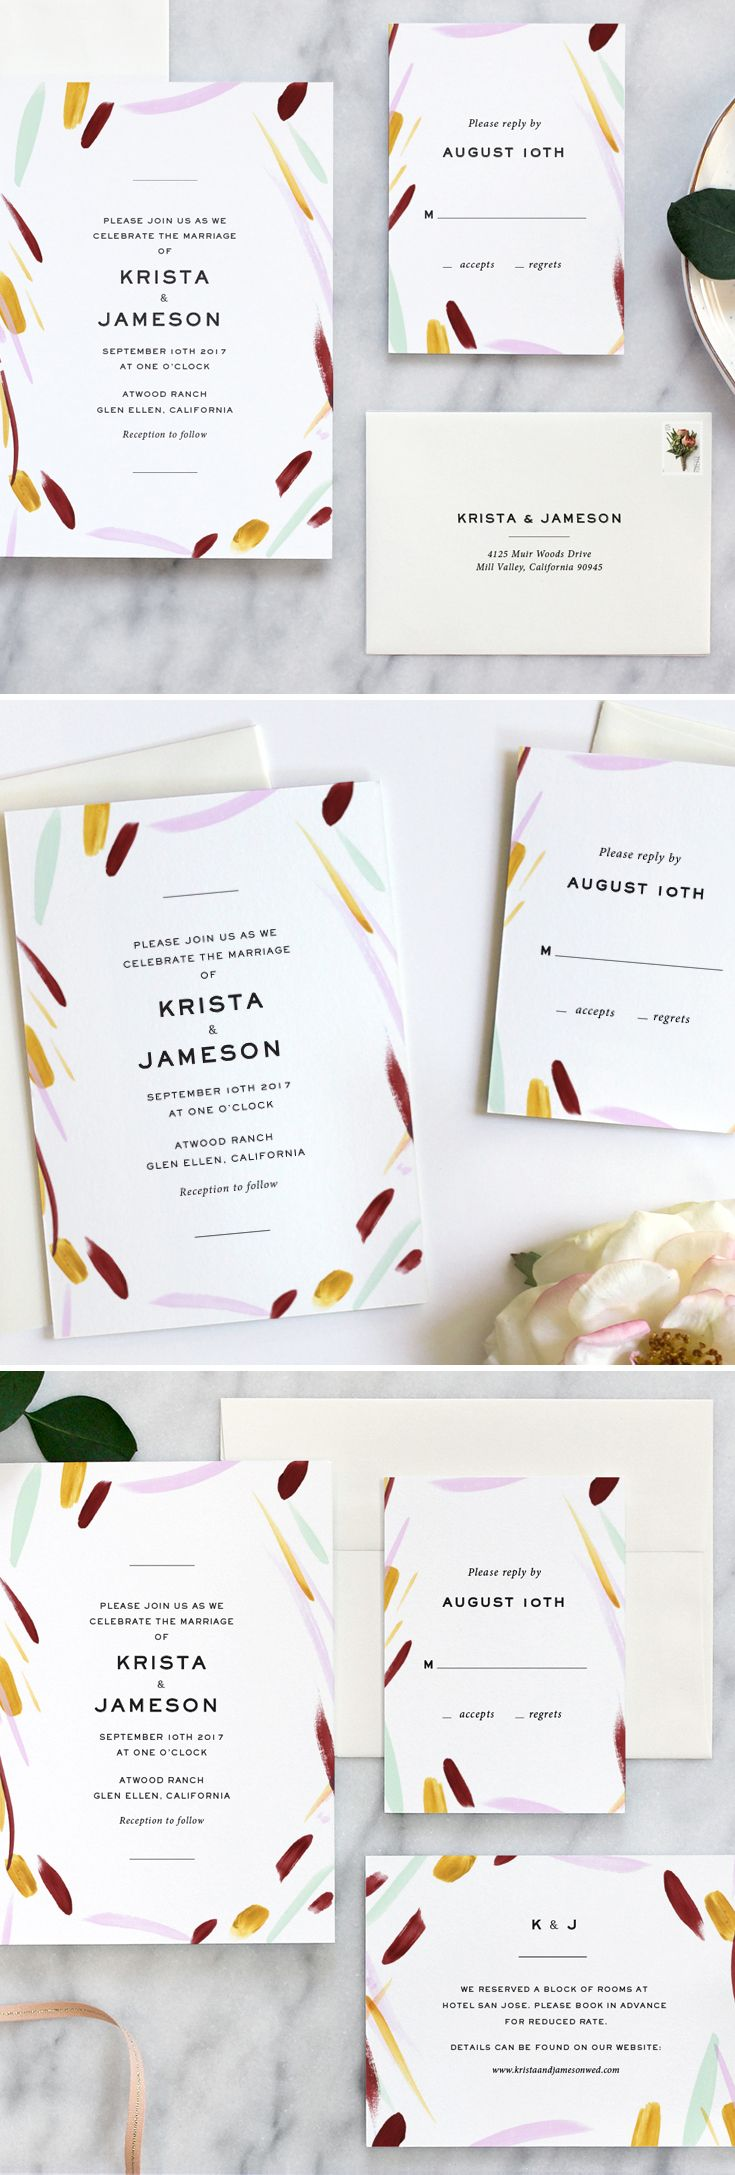 Modern wedding invitation suite by Fine Day Press